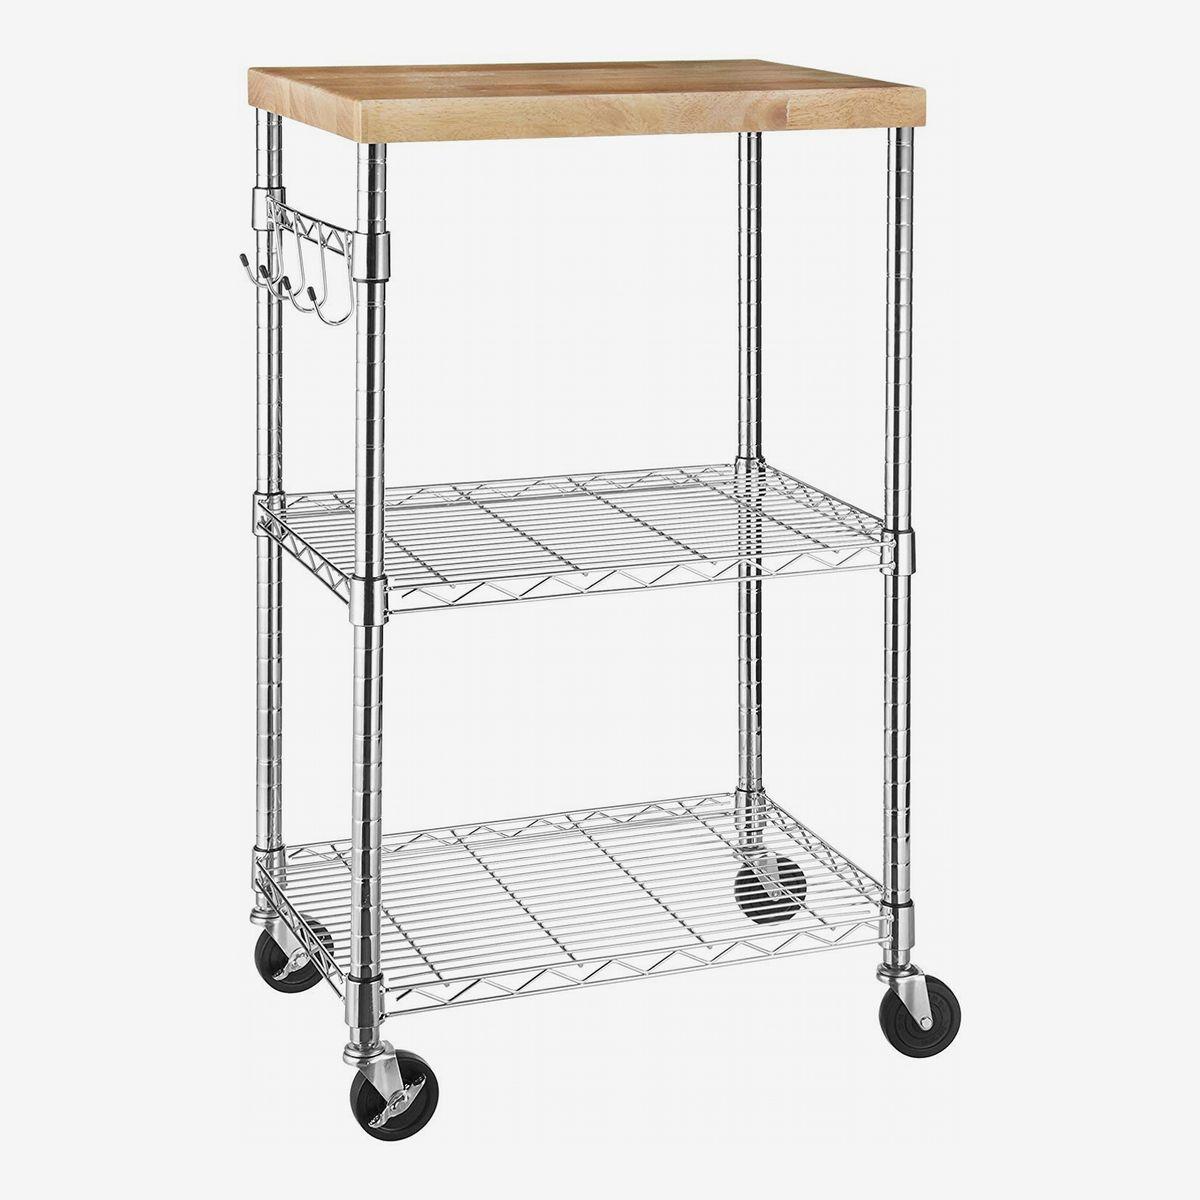 9 Best Kitchen Carts And Portable Kitchen Islands 2020 The Strategist New York Magazine